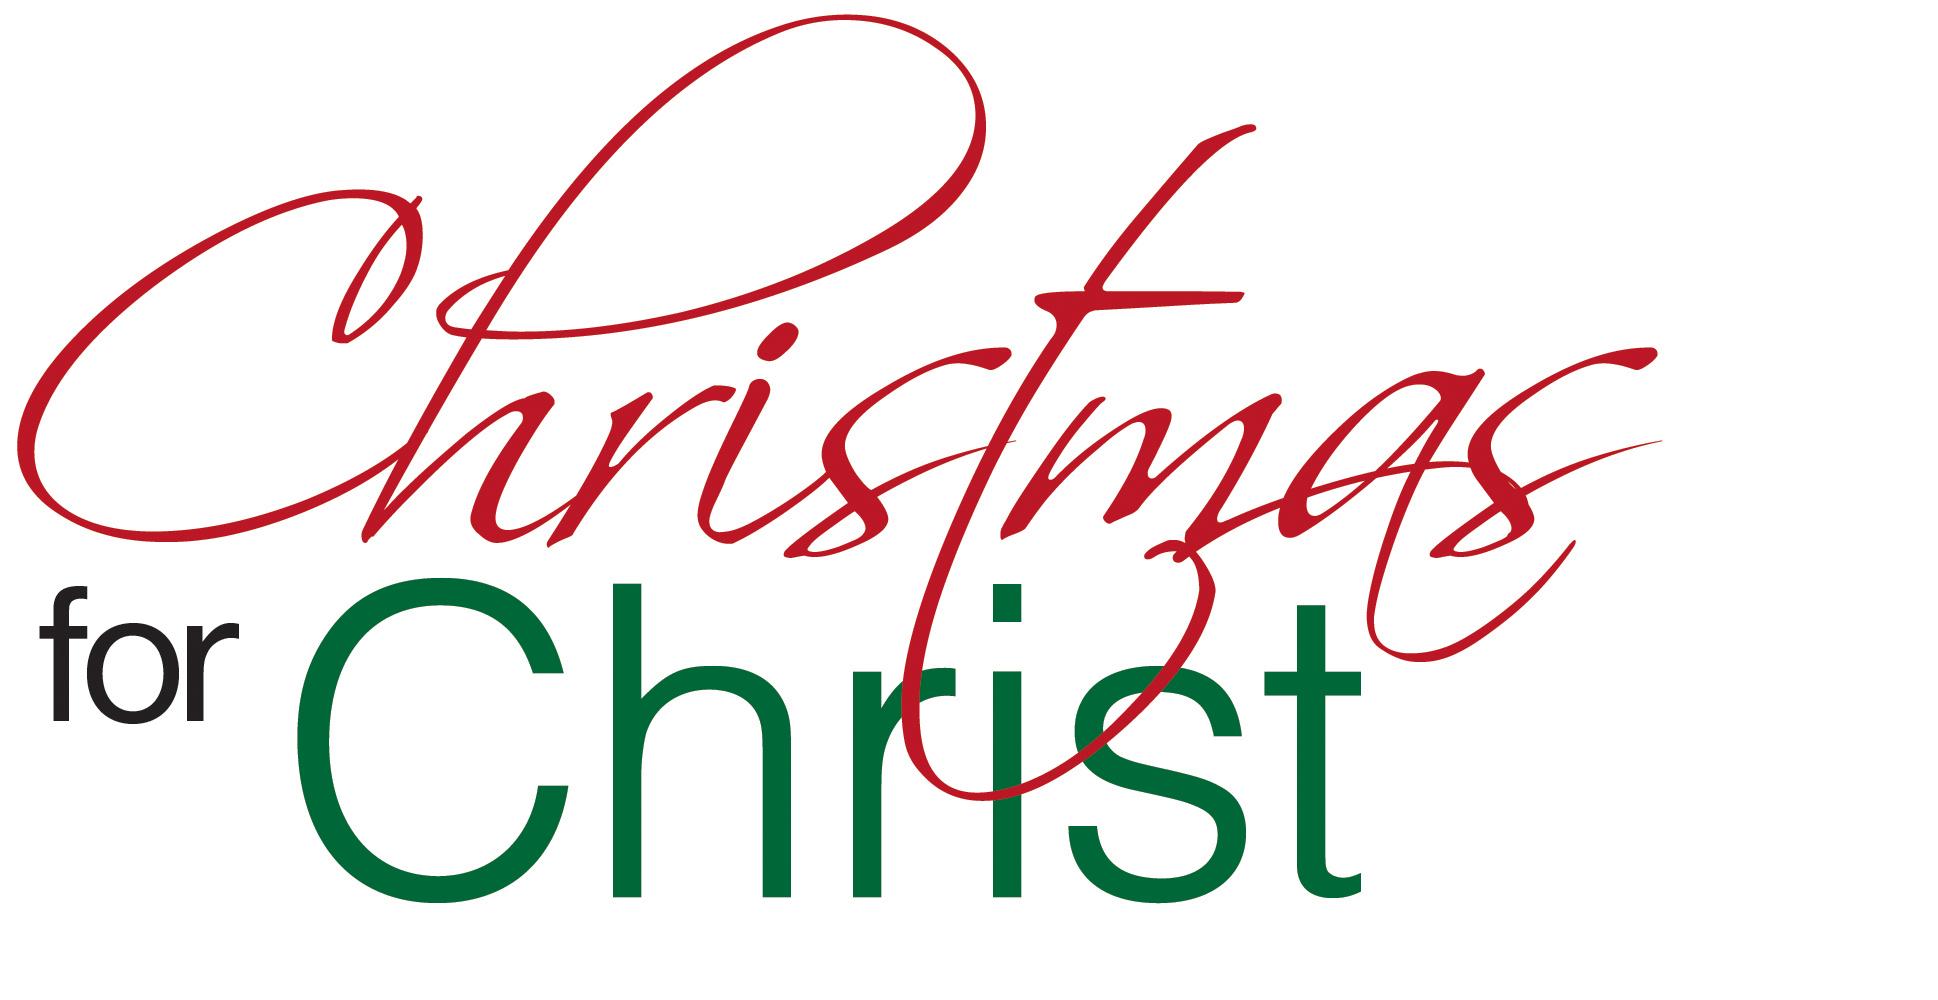 Christian Merry Christmas Clipart